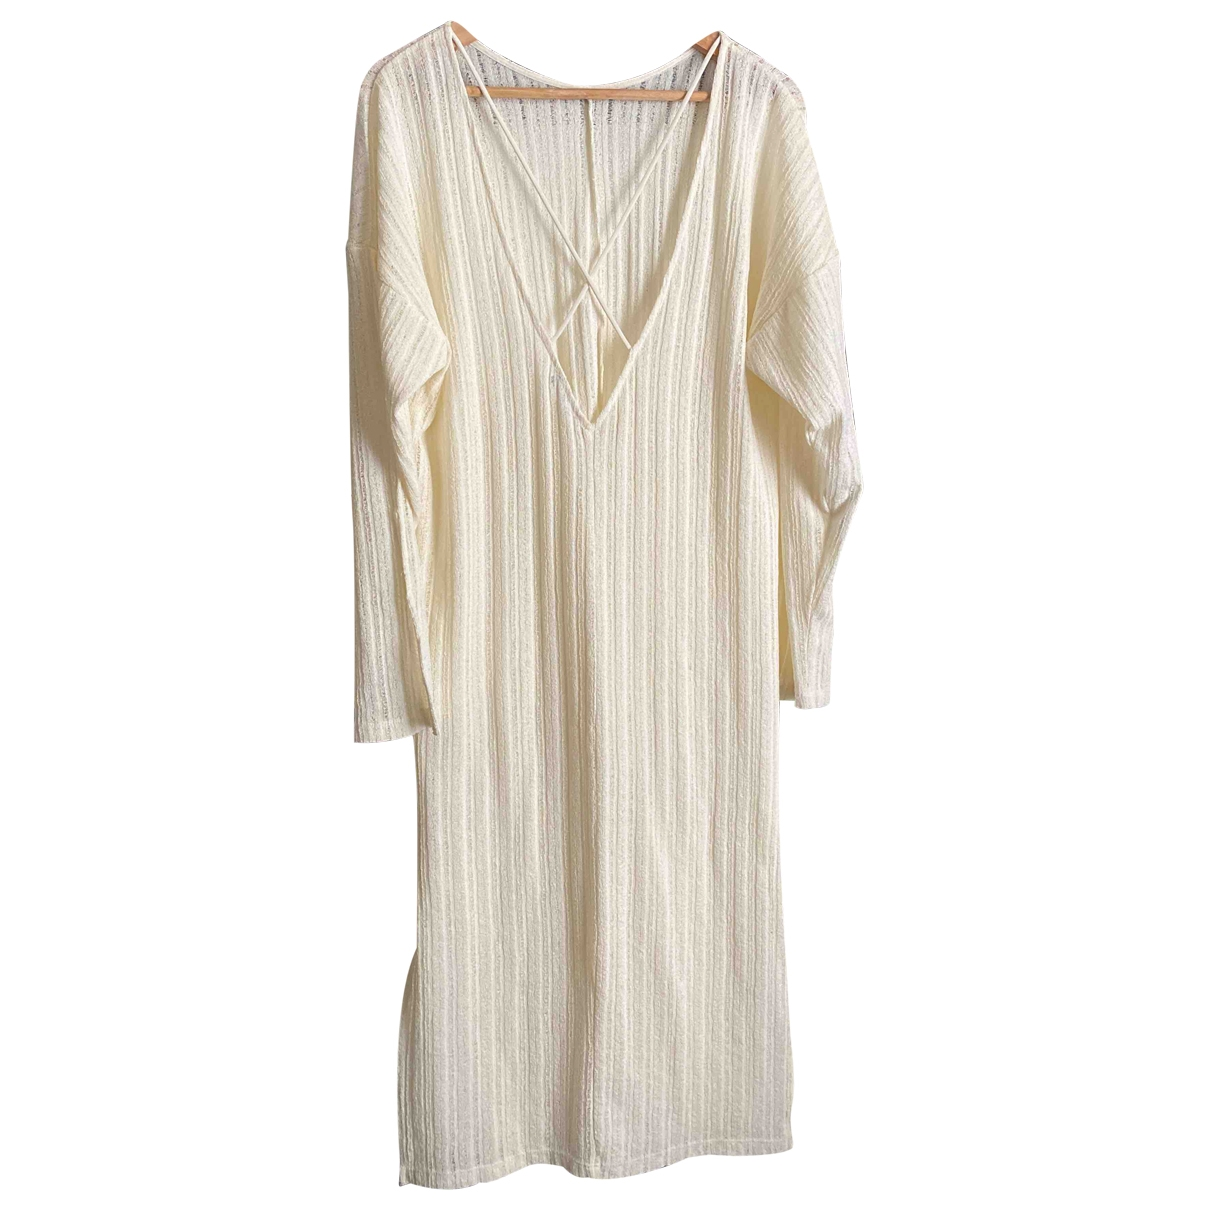 Zara \N Kleid in  Ecru Synthetik